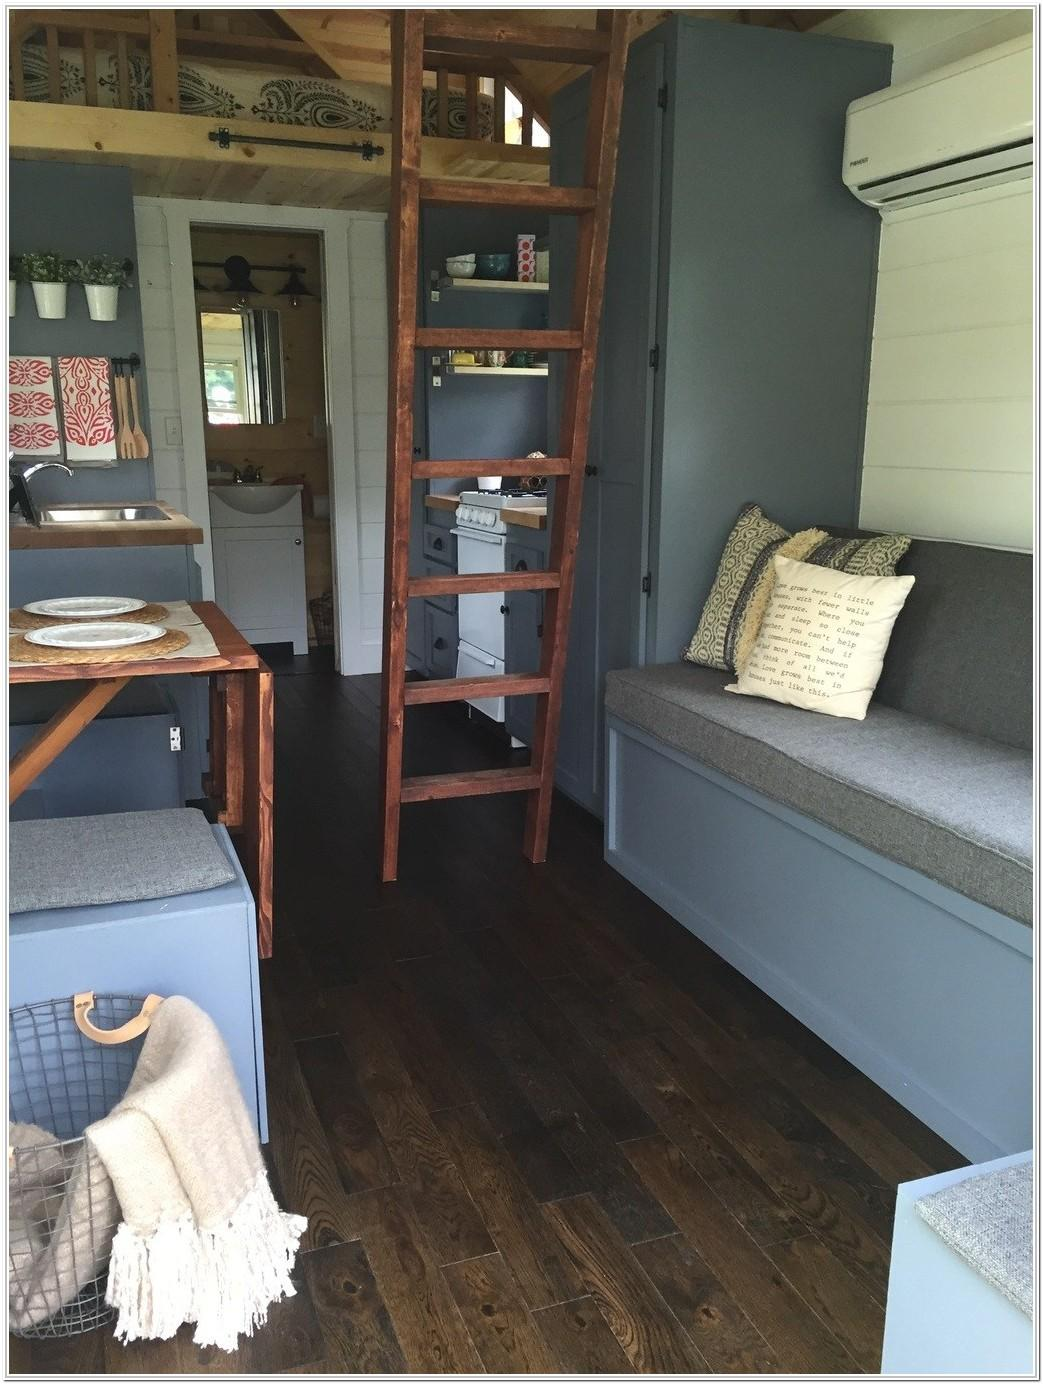 250 Sq Ft Living Room Ideas